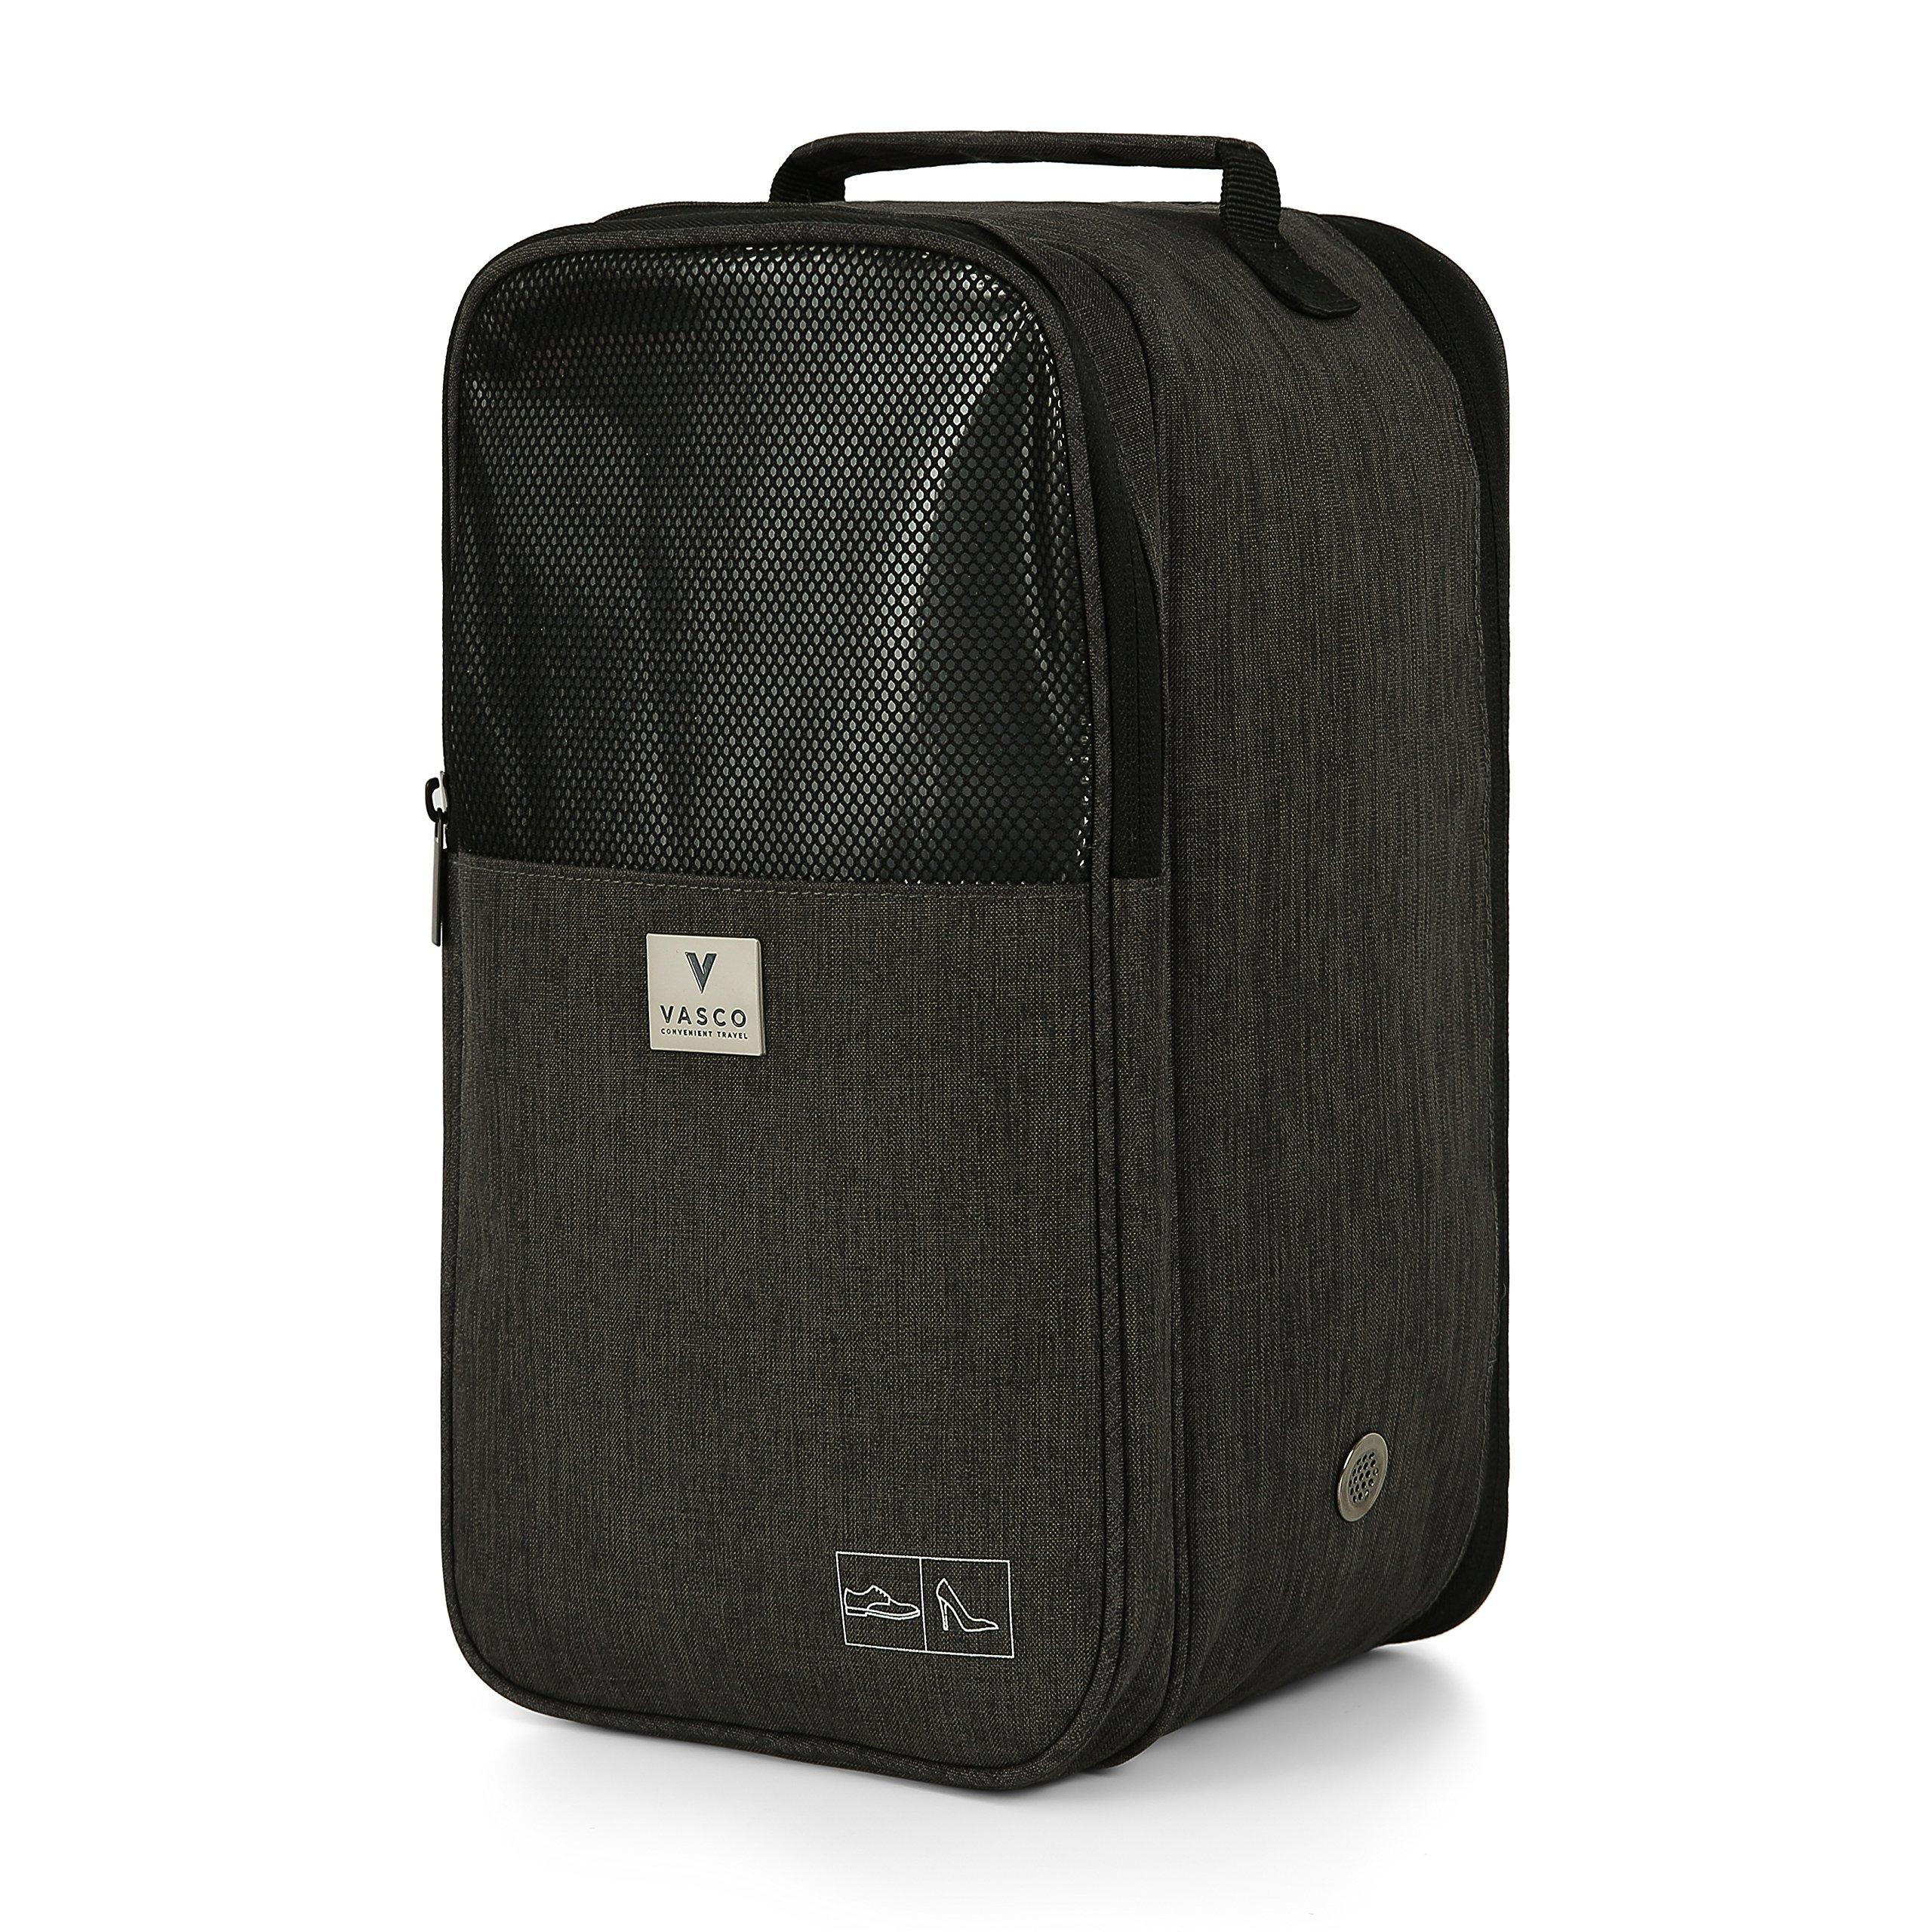 VASCO Shoe Travel Bag – Zipper Bags – Suitable as Shoe Gym Bag – For Men & Women - Black